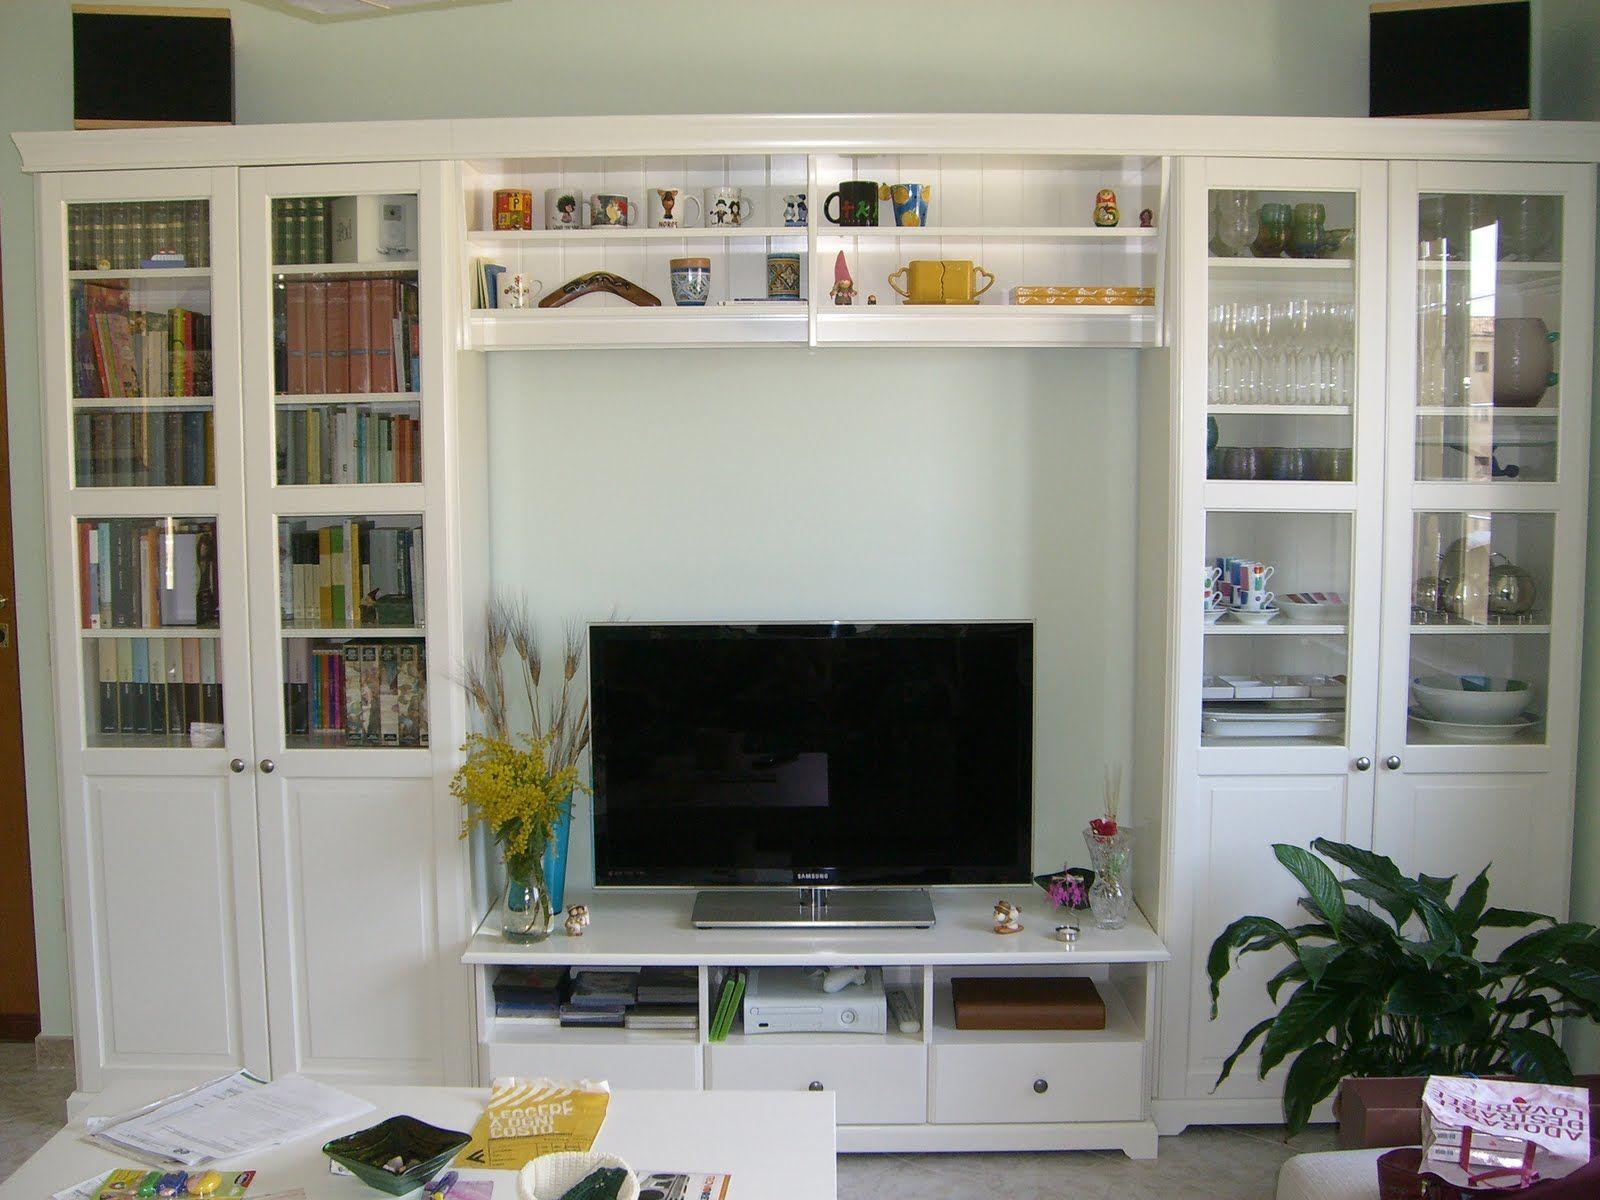 Credenza Liatorp Ikea : Image result for liatorp casa in